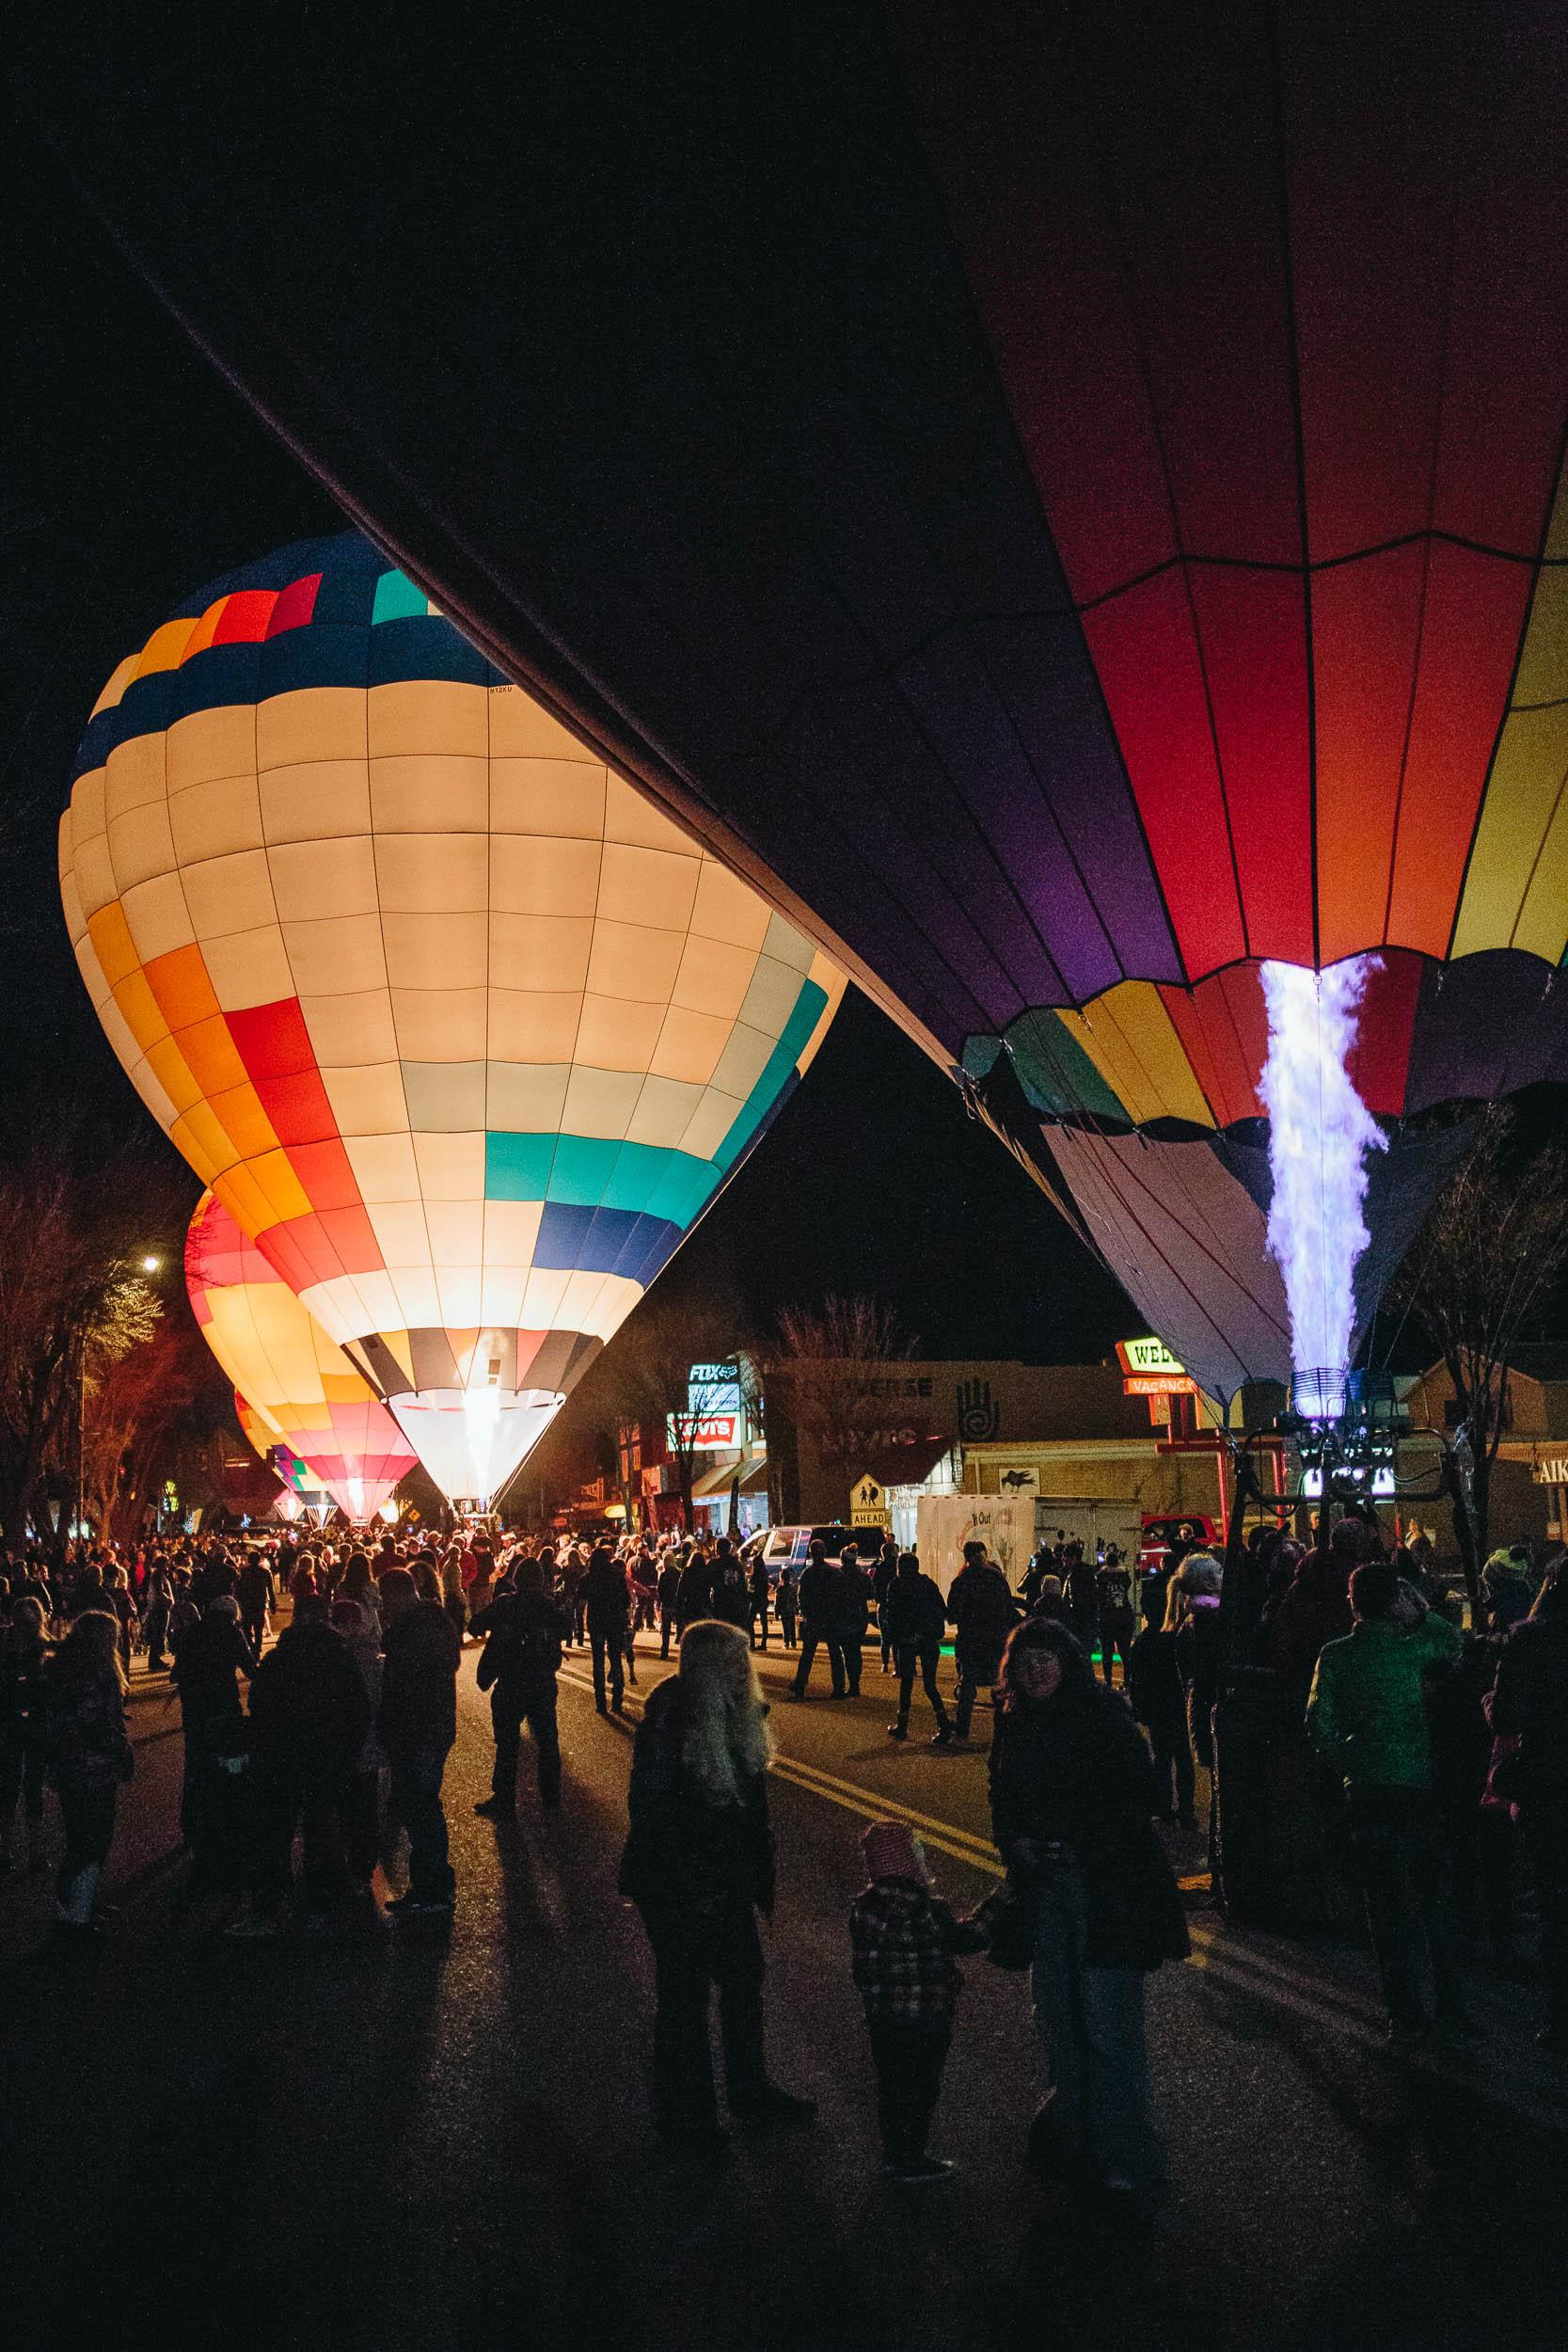 Kyle-Sheppard-Kanab-Balloon-Festival-50.jpg